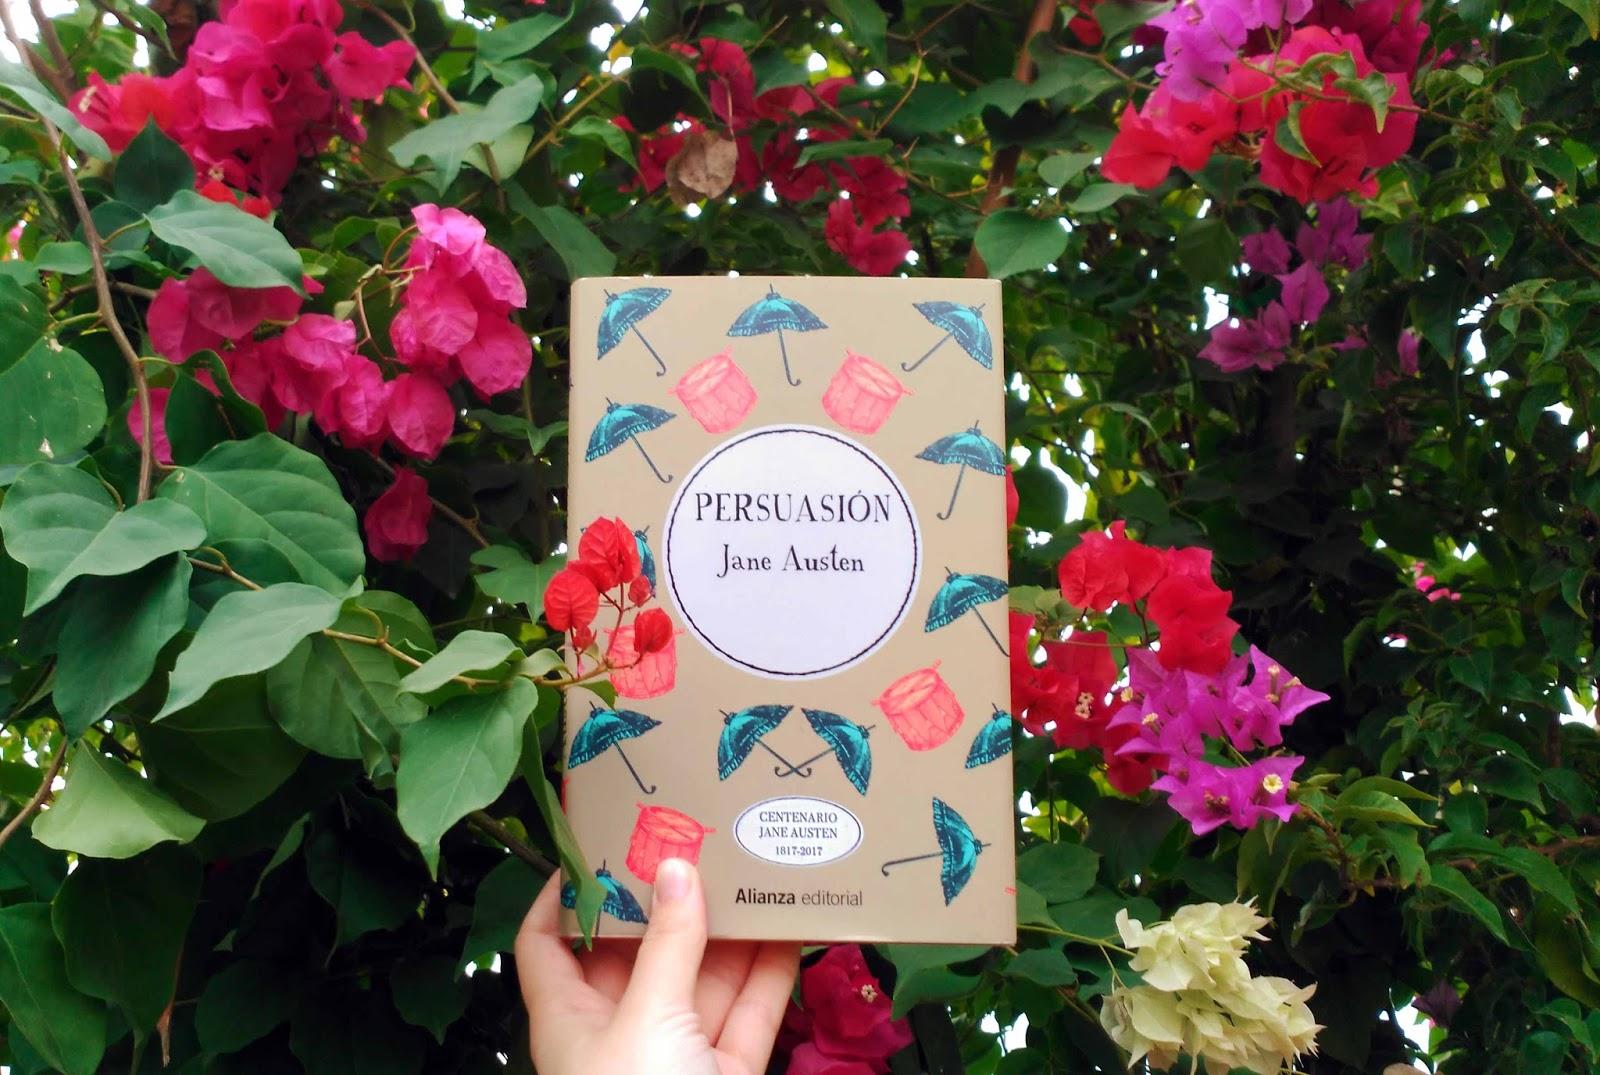 Persuasió Jane Austen ressenya